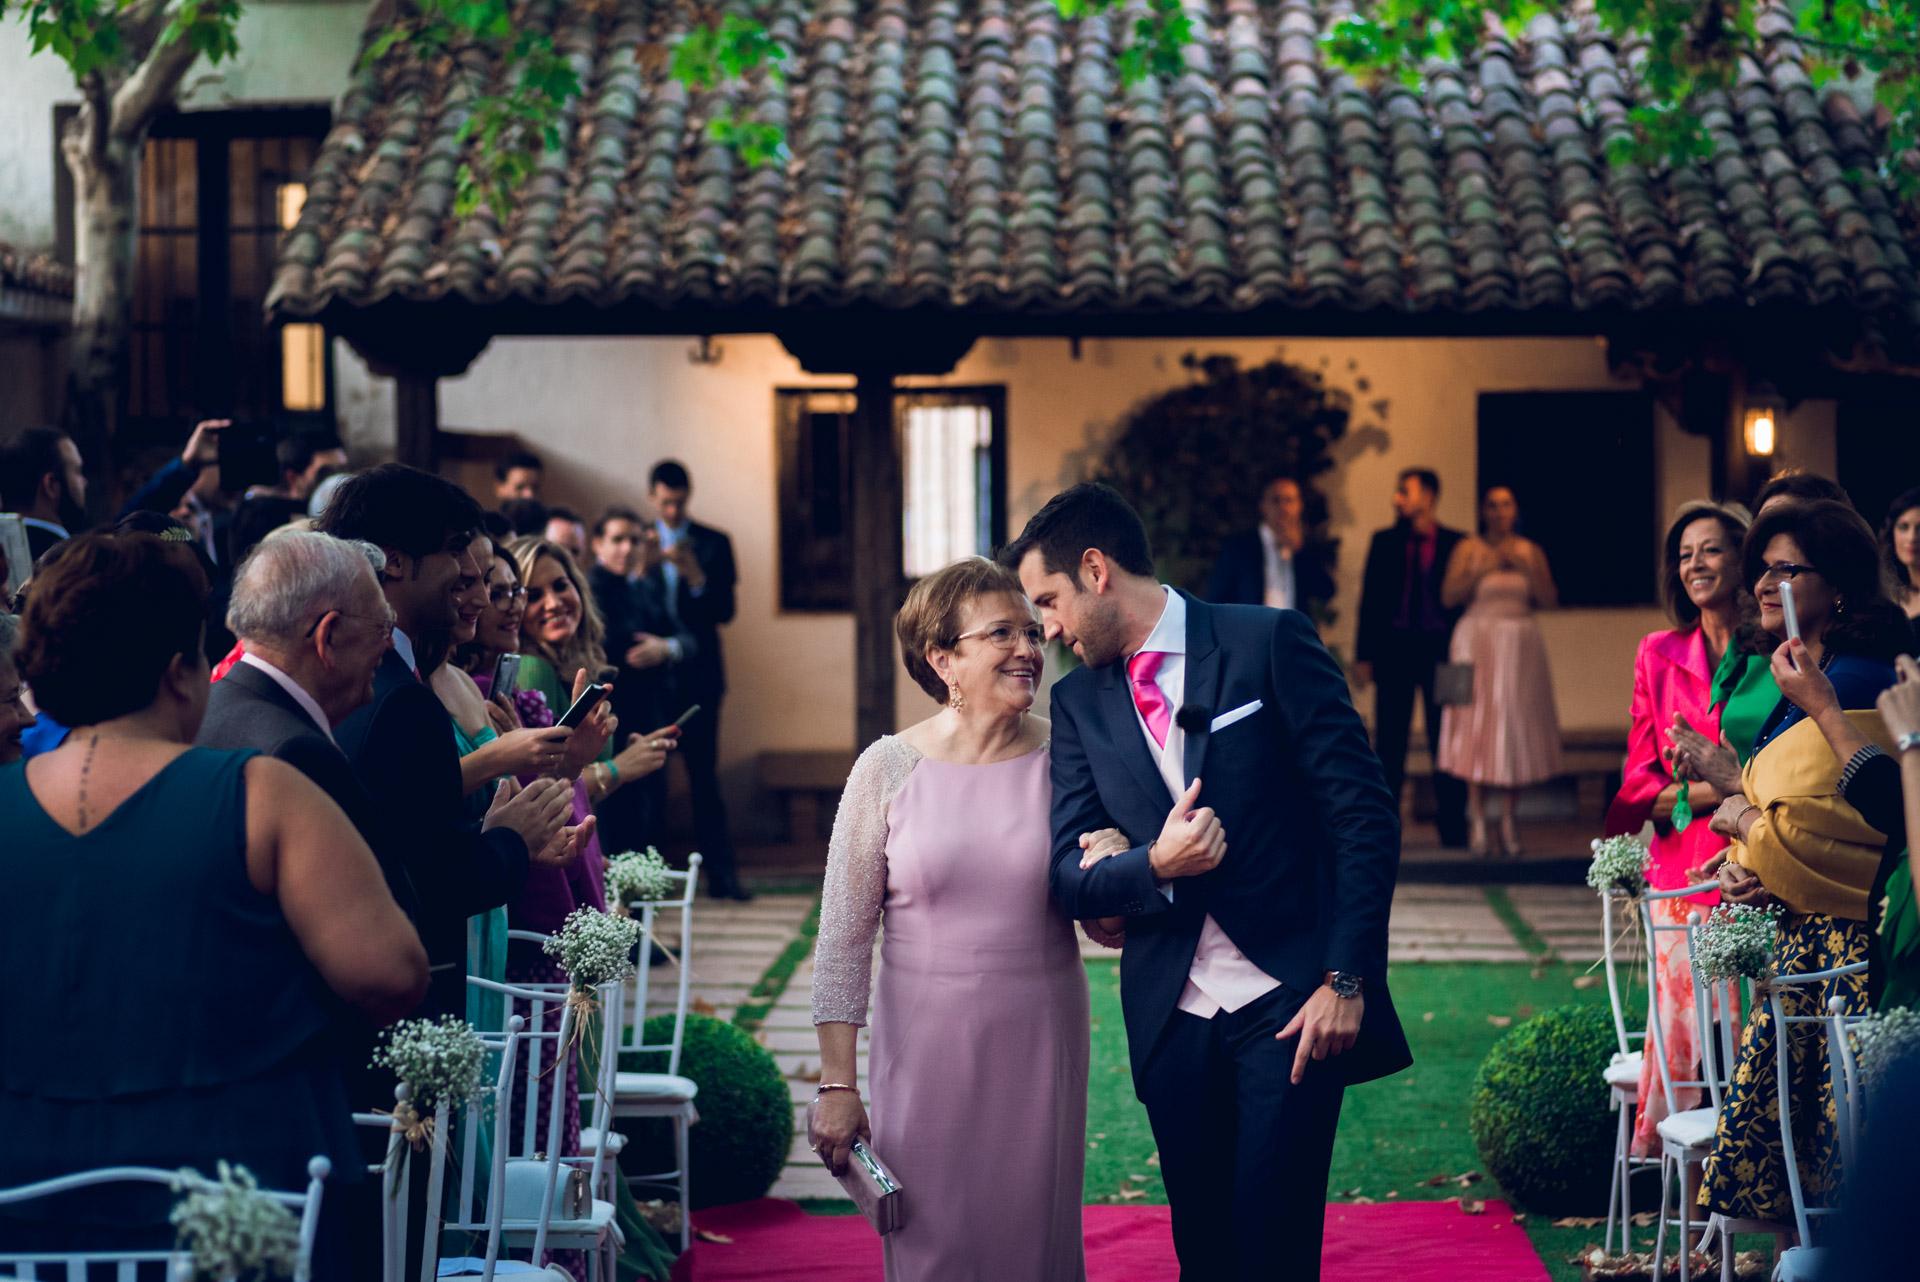 Cómo elegir fotógrafo de boda.